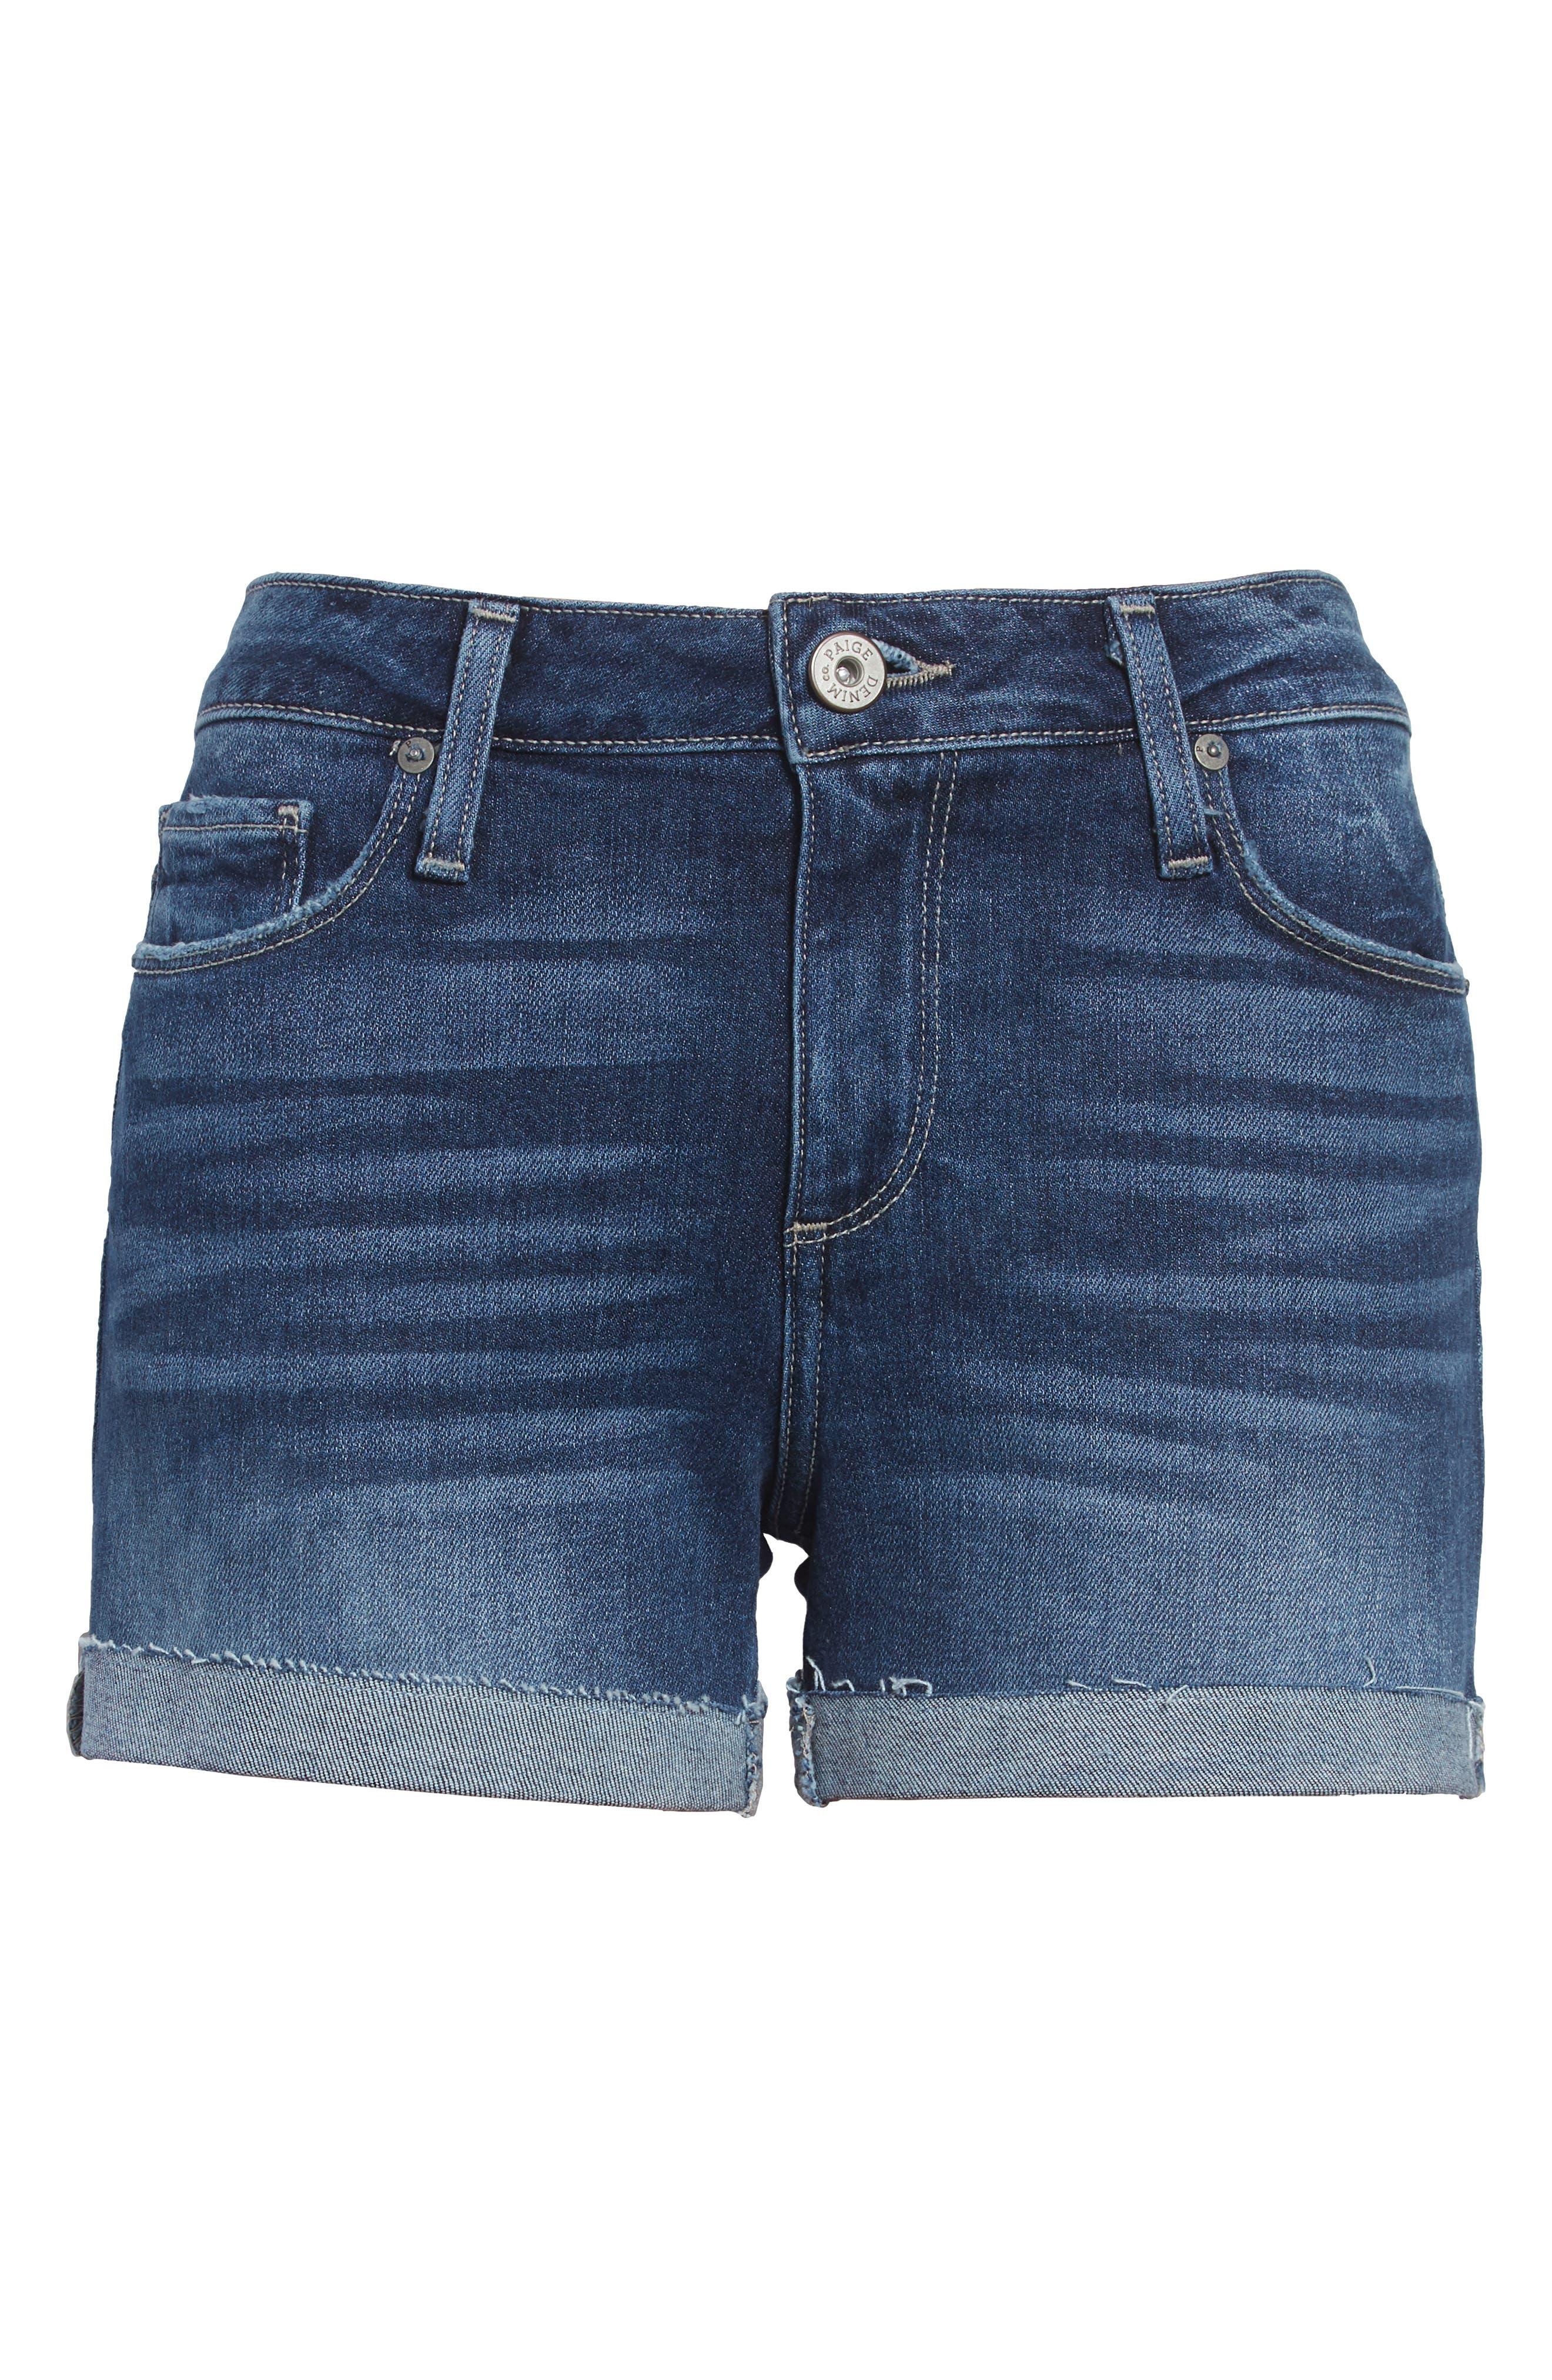 Jimmy Jimmy Raw Cuff Denim Shorts,                             Alternate thumbnail 3, color,                             KYLEN